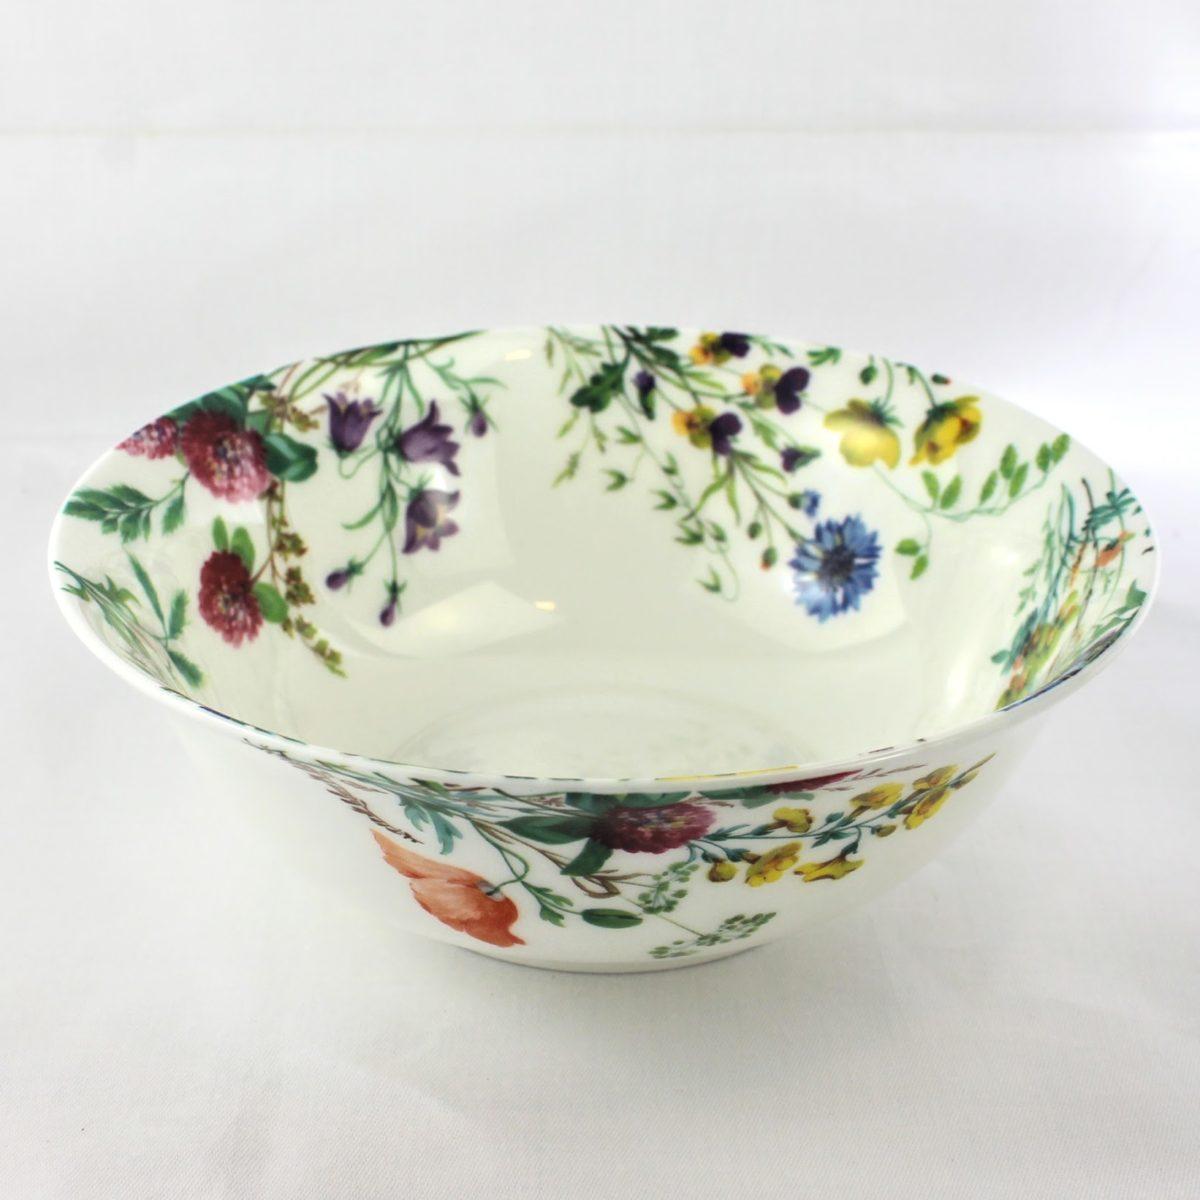 7 inch bone china desert bowl, meadow flowers, violas, red clover, corn flowers